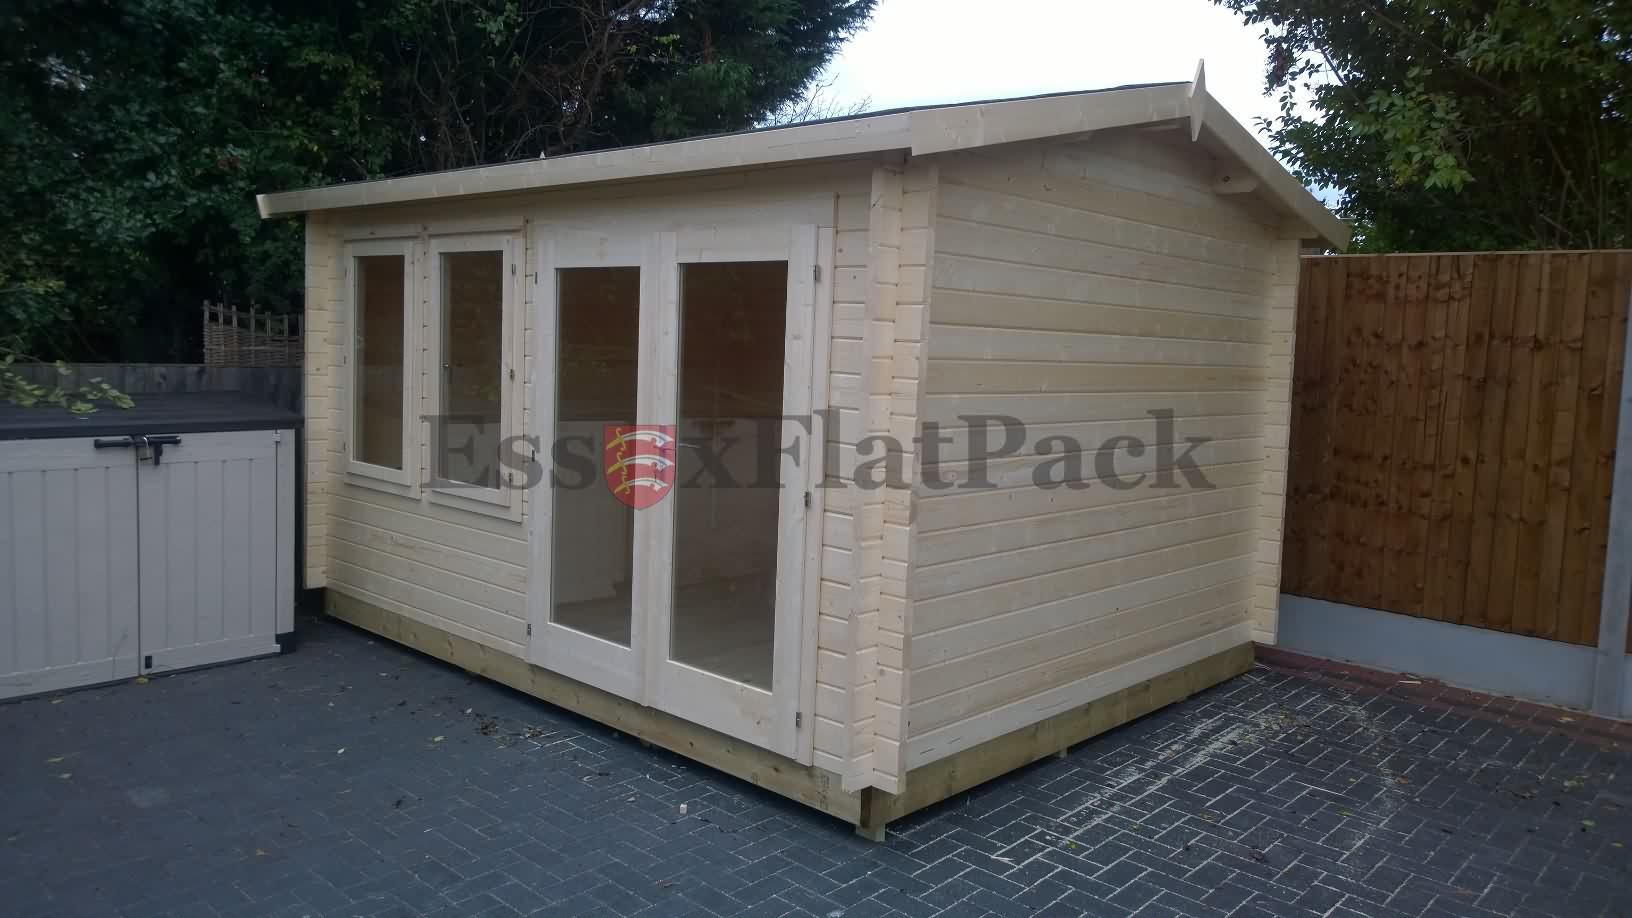 essexflatpack-log-cabins-20161106140401.jpg